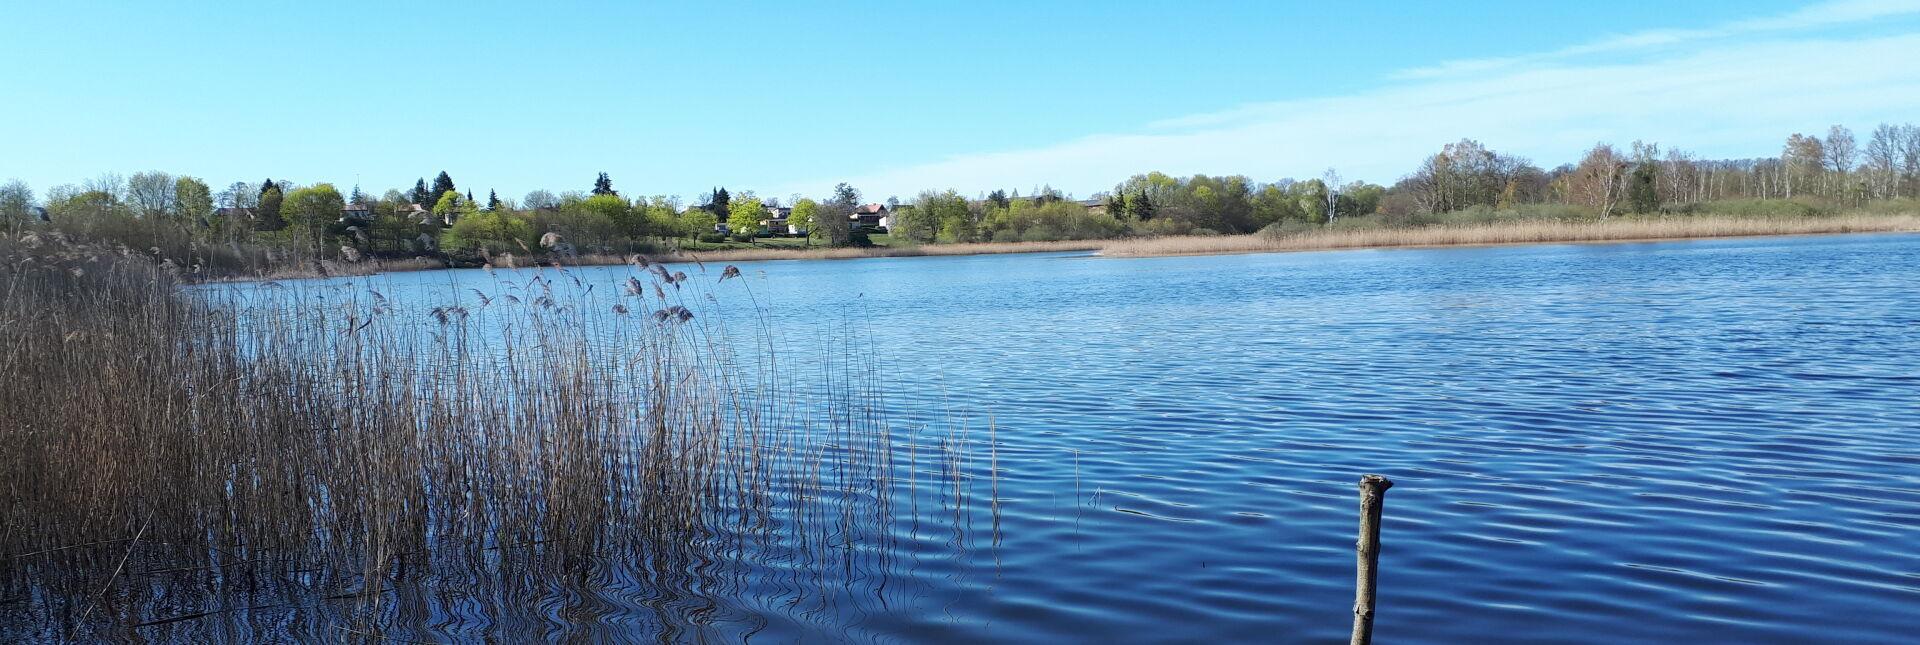 Lebehn See